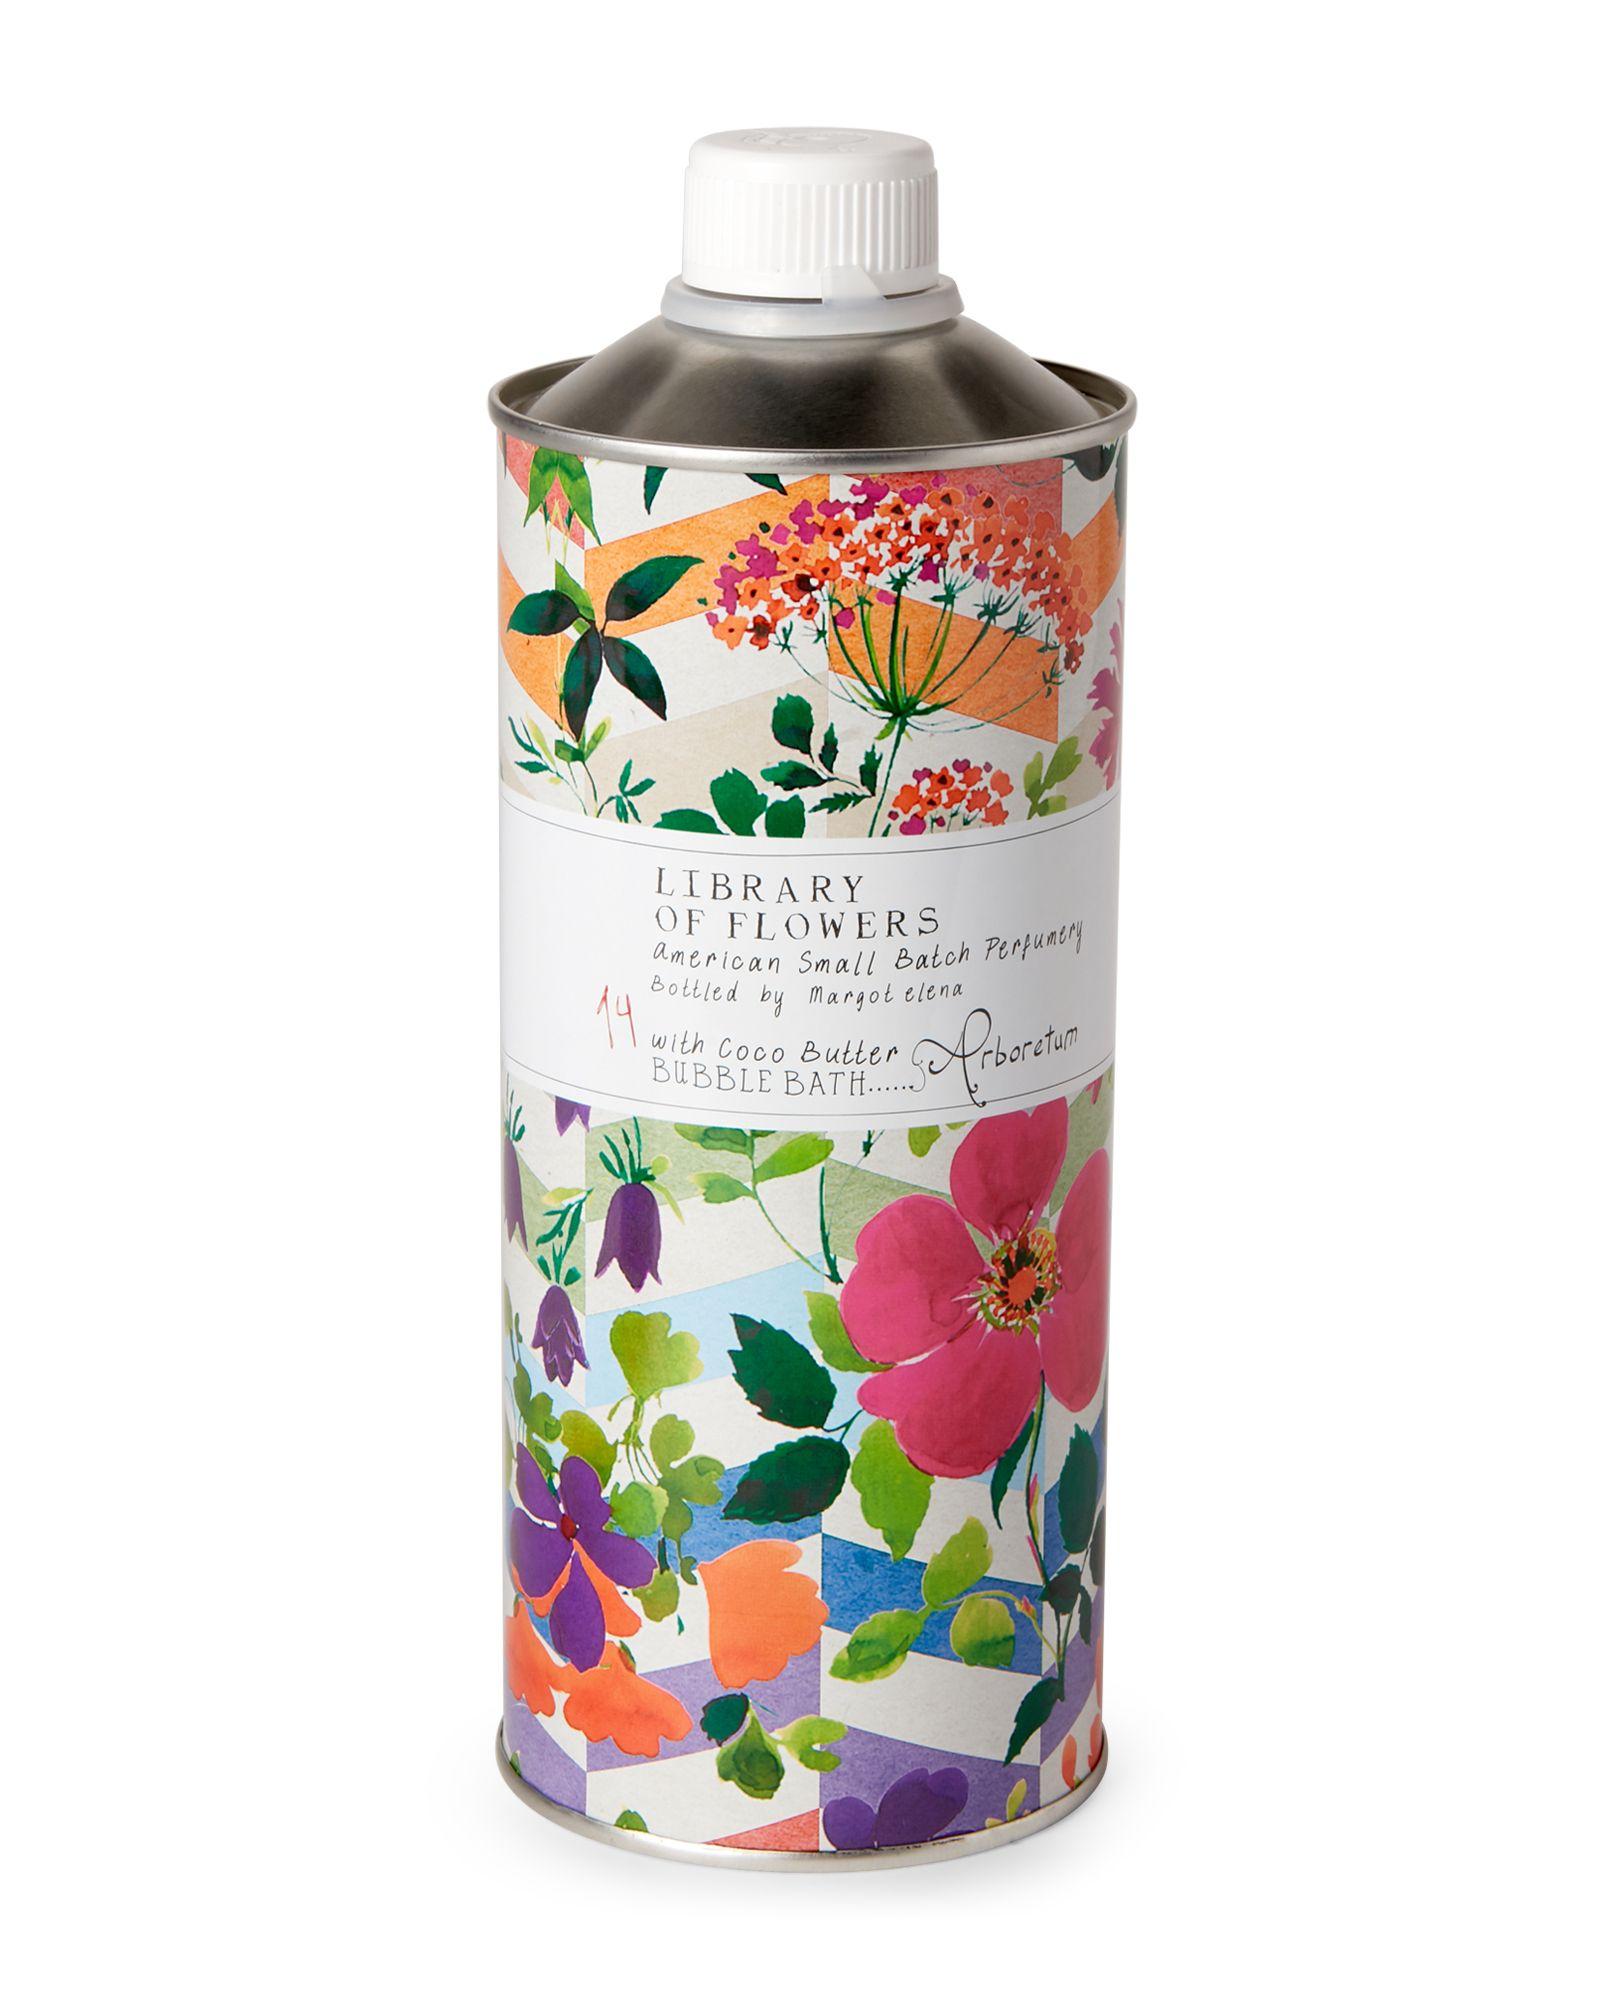 Margot Elena Library Of Flowers Arboretum Bubble Bath